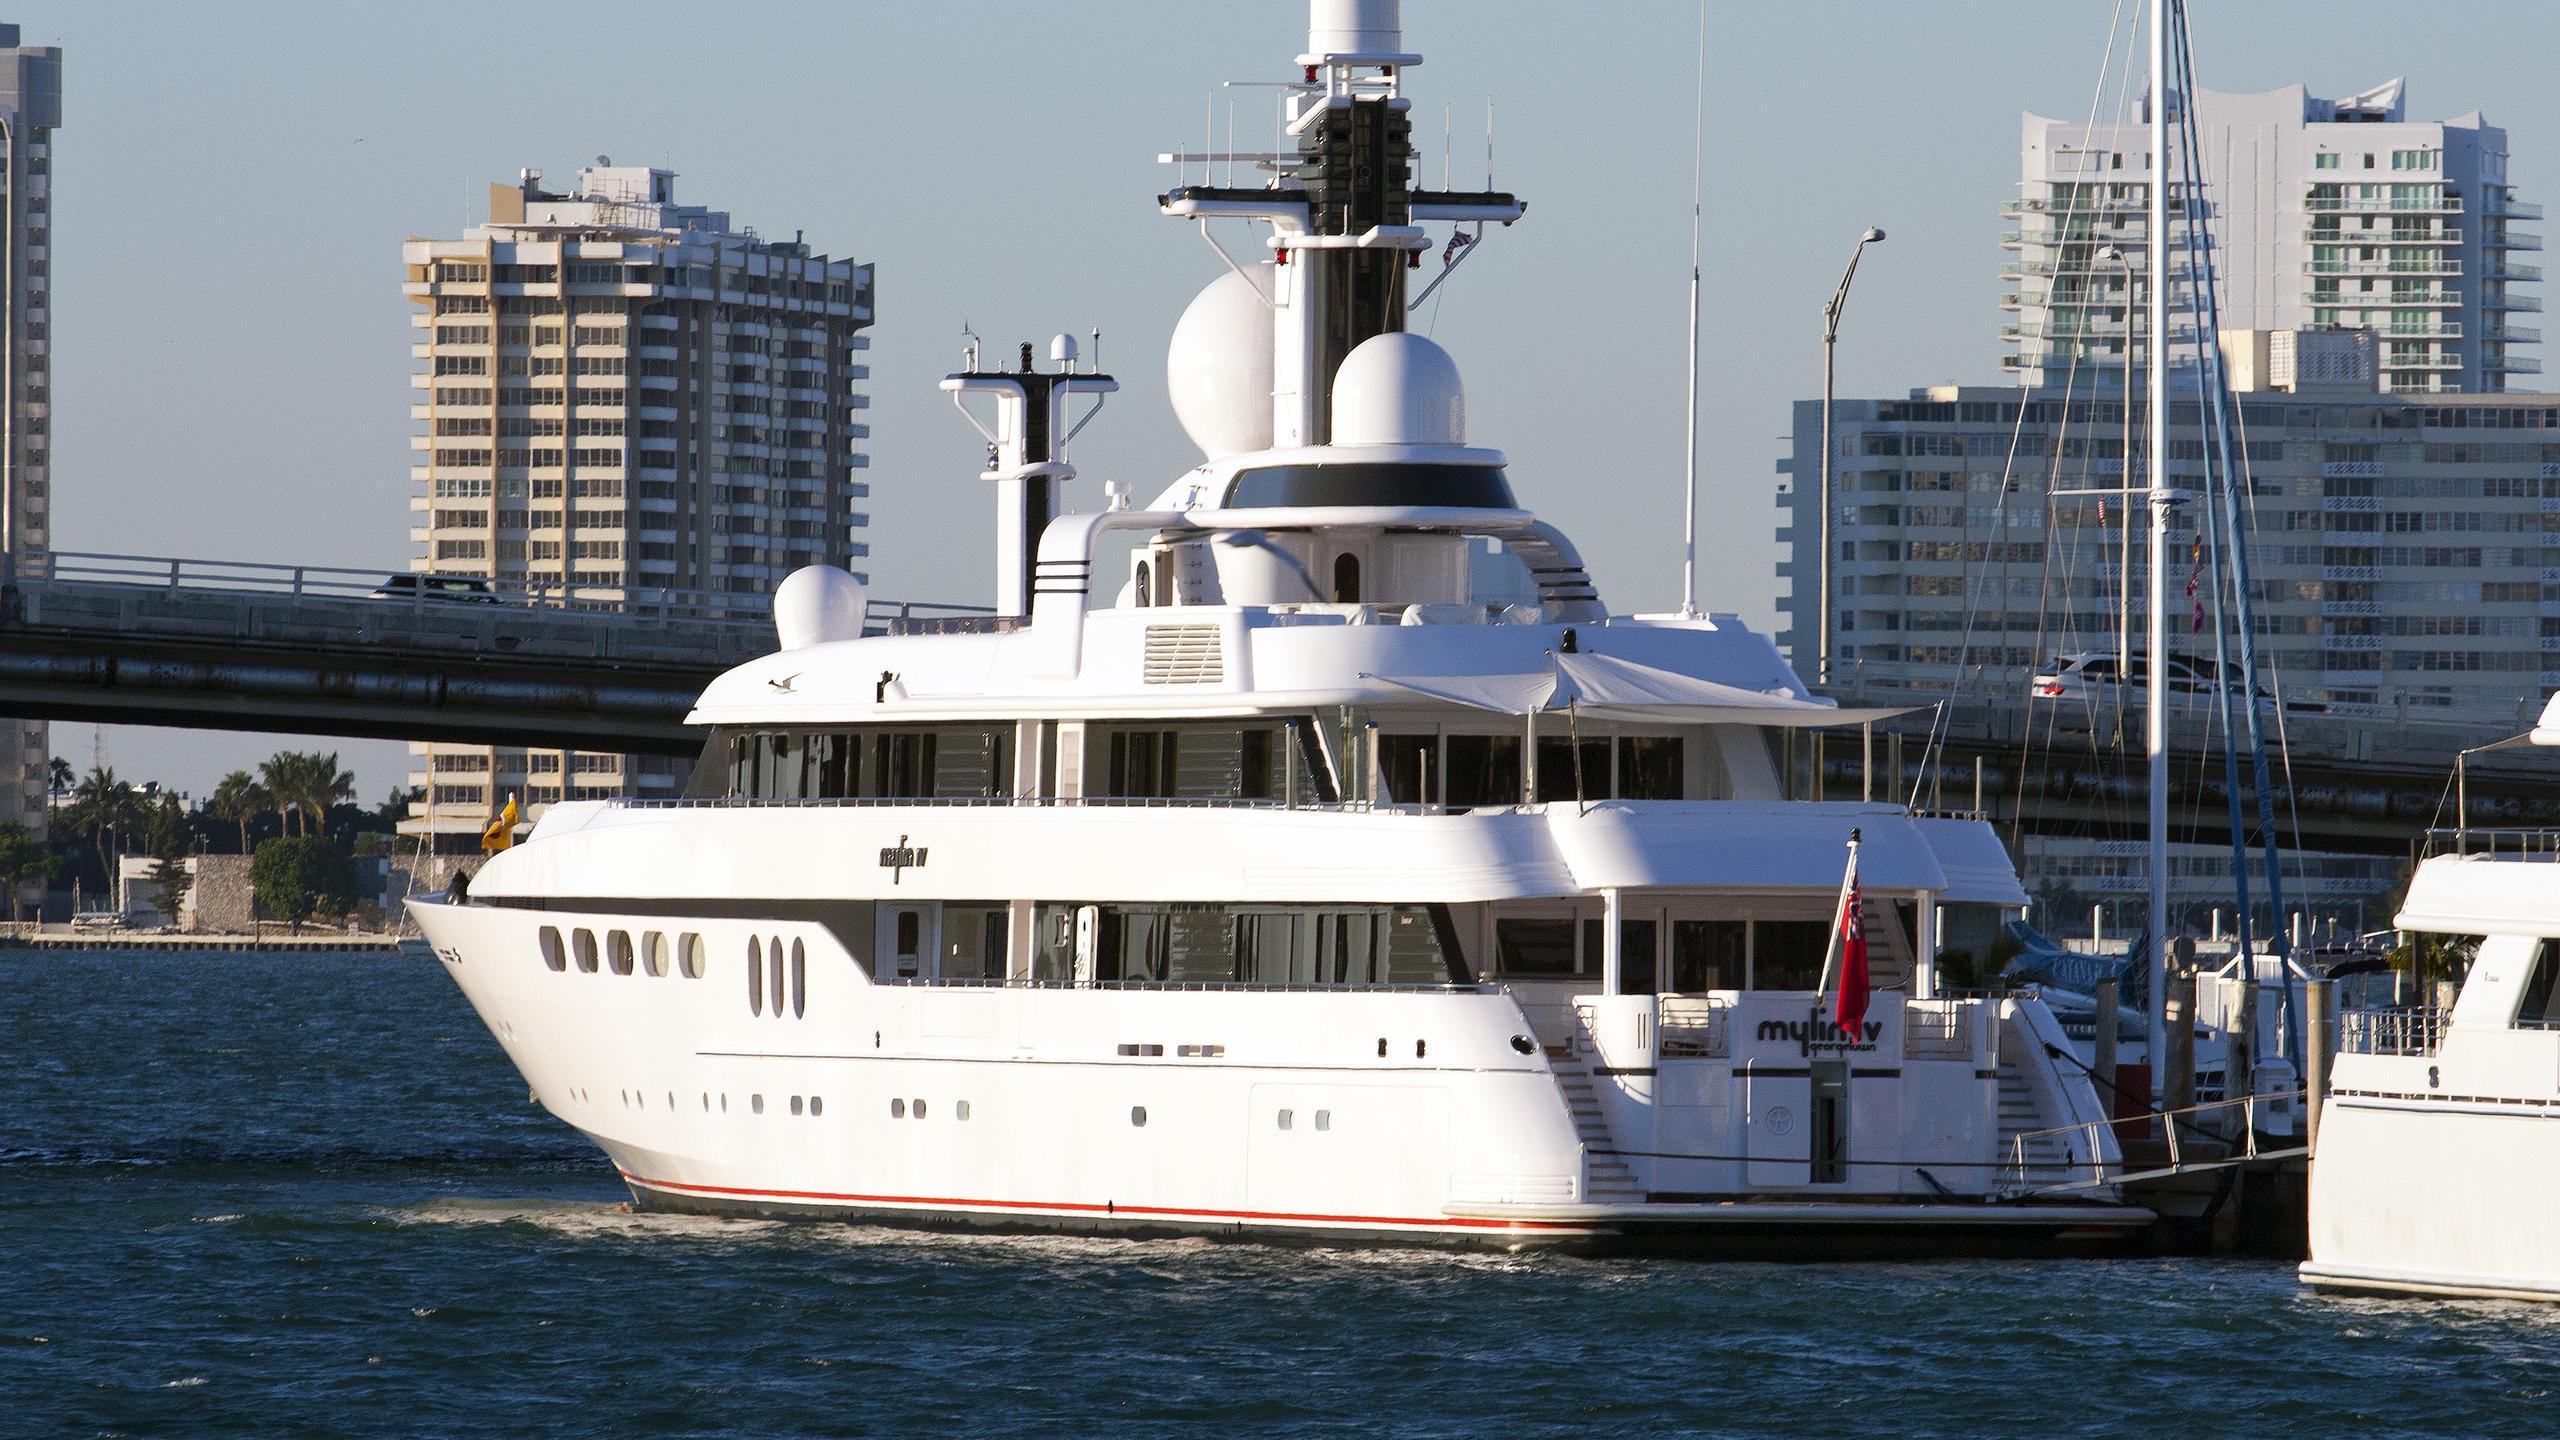 mylin-iv-motor-yacht-feadship-1992-61m-stern